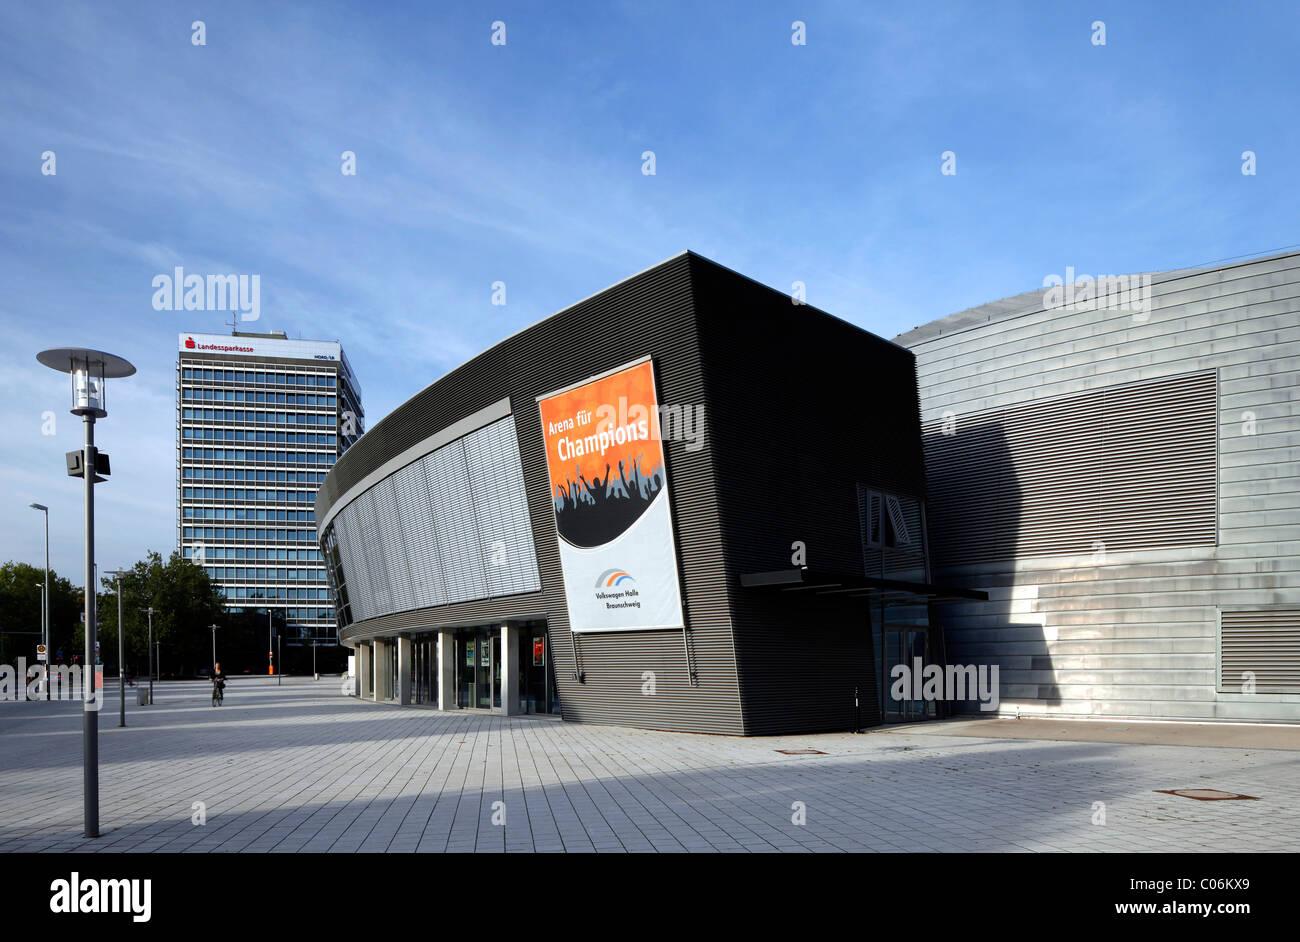 Volkswagen Halle sporting arena, Braunschweig, Brunswick, Lower Saxony, Germany, Europe - Stock Image